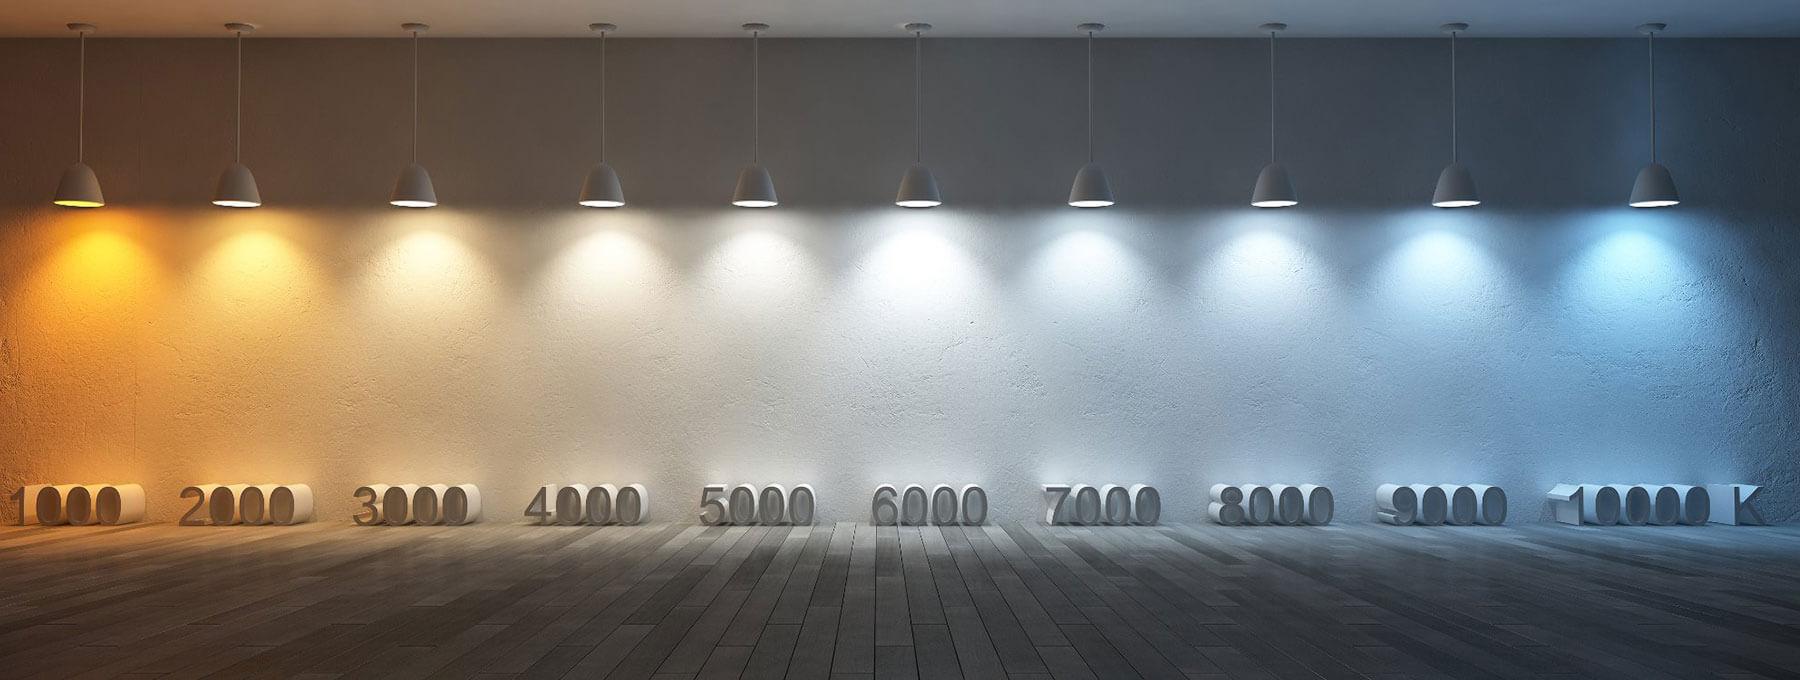 Residential Lighting and Lighting Retrofits